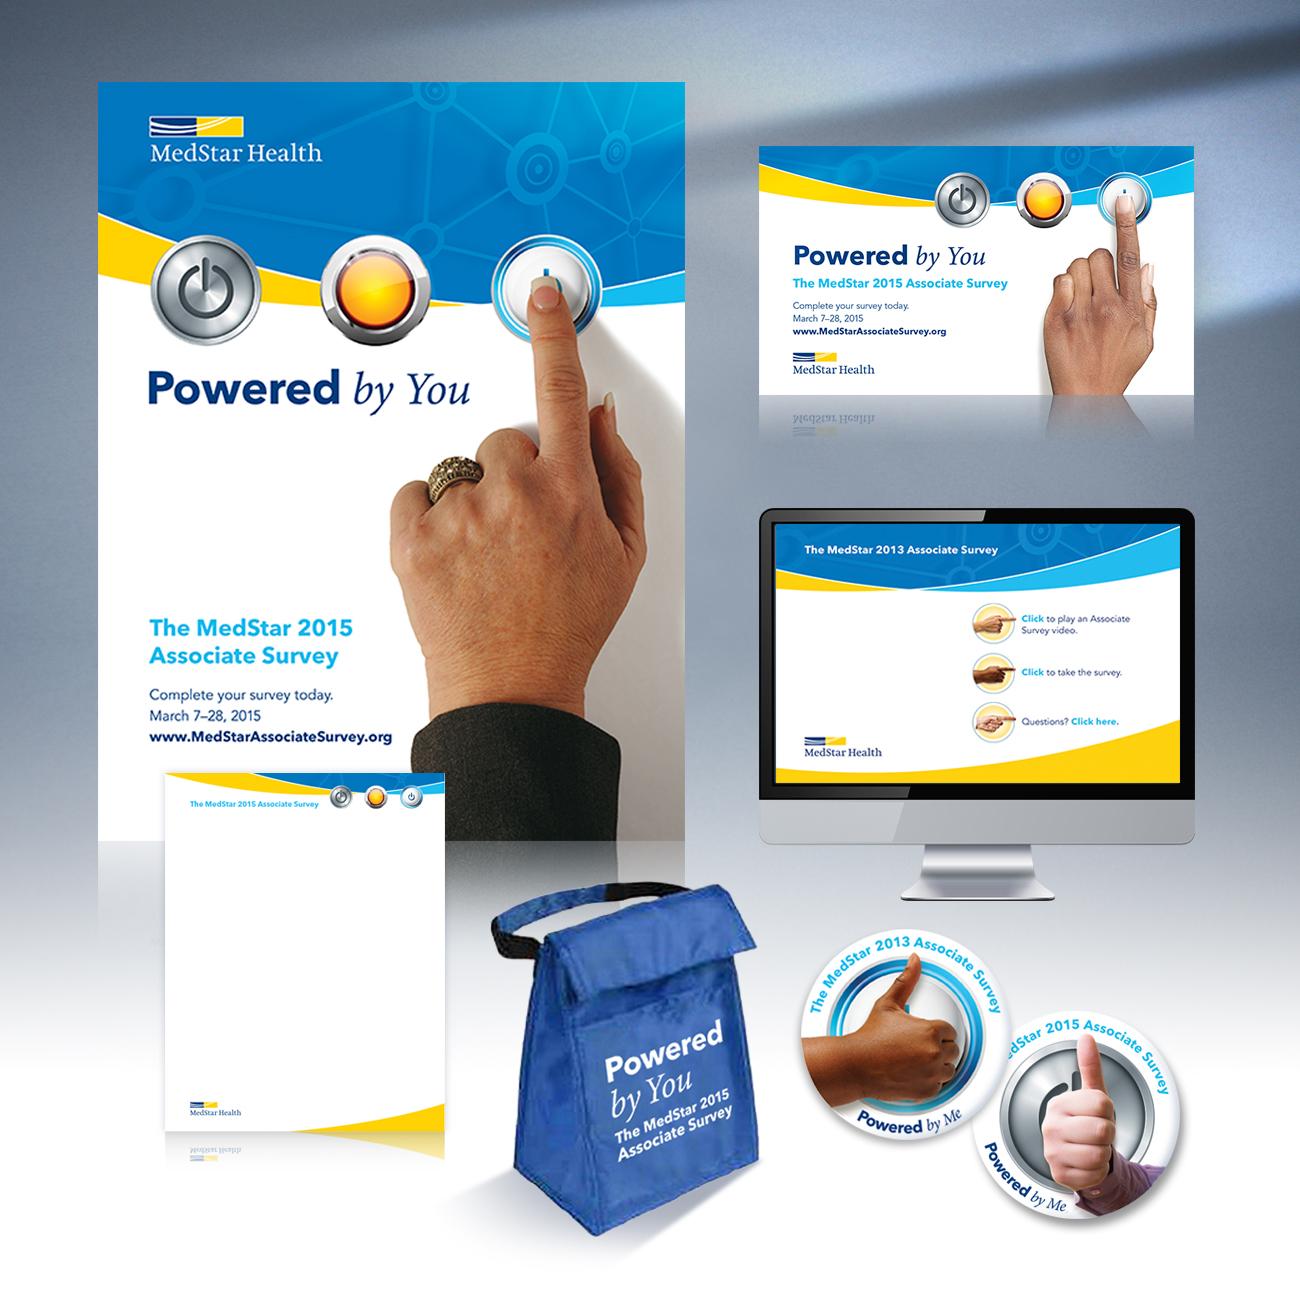 MedStar Health Associate Survey Toolkit